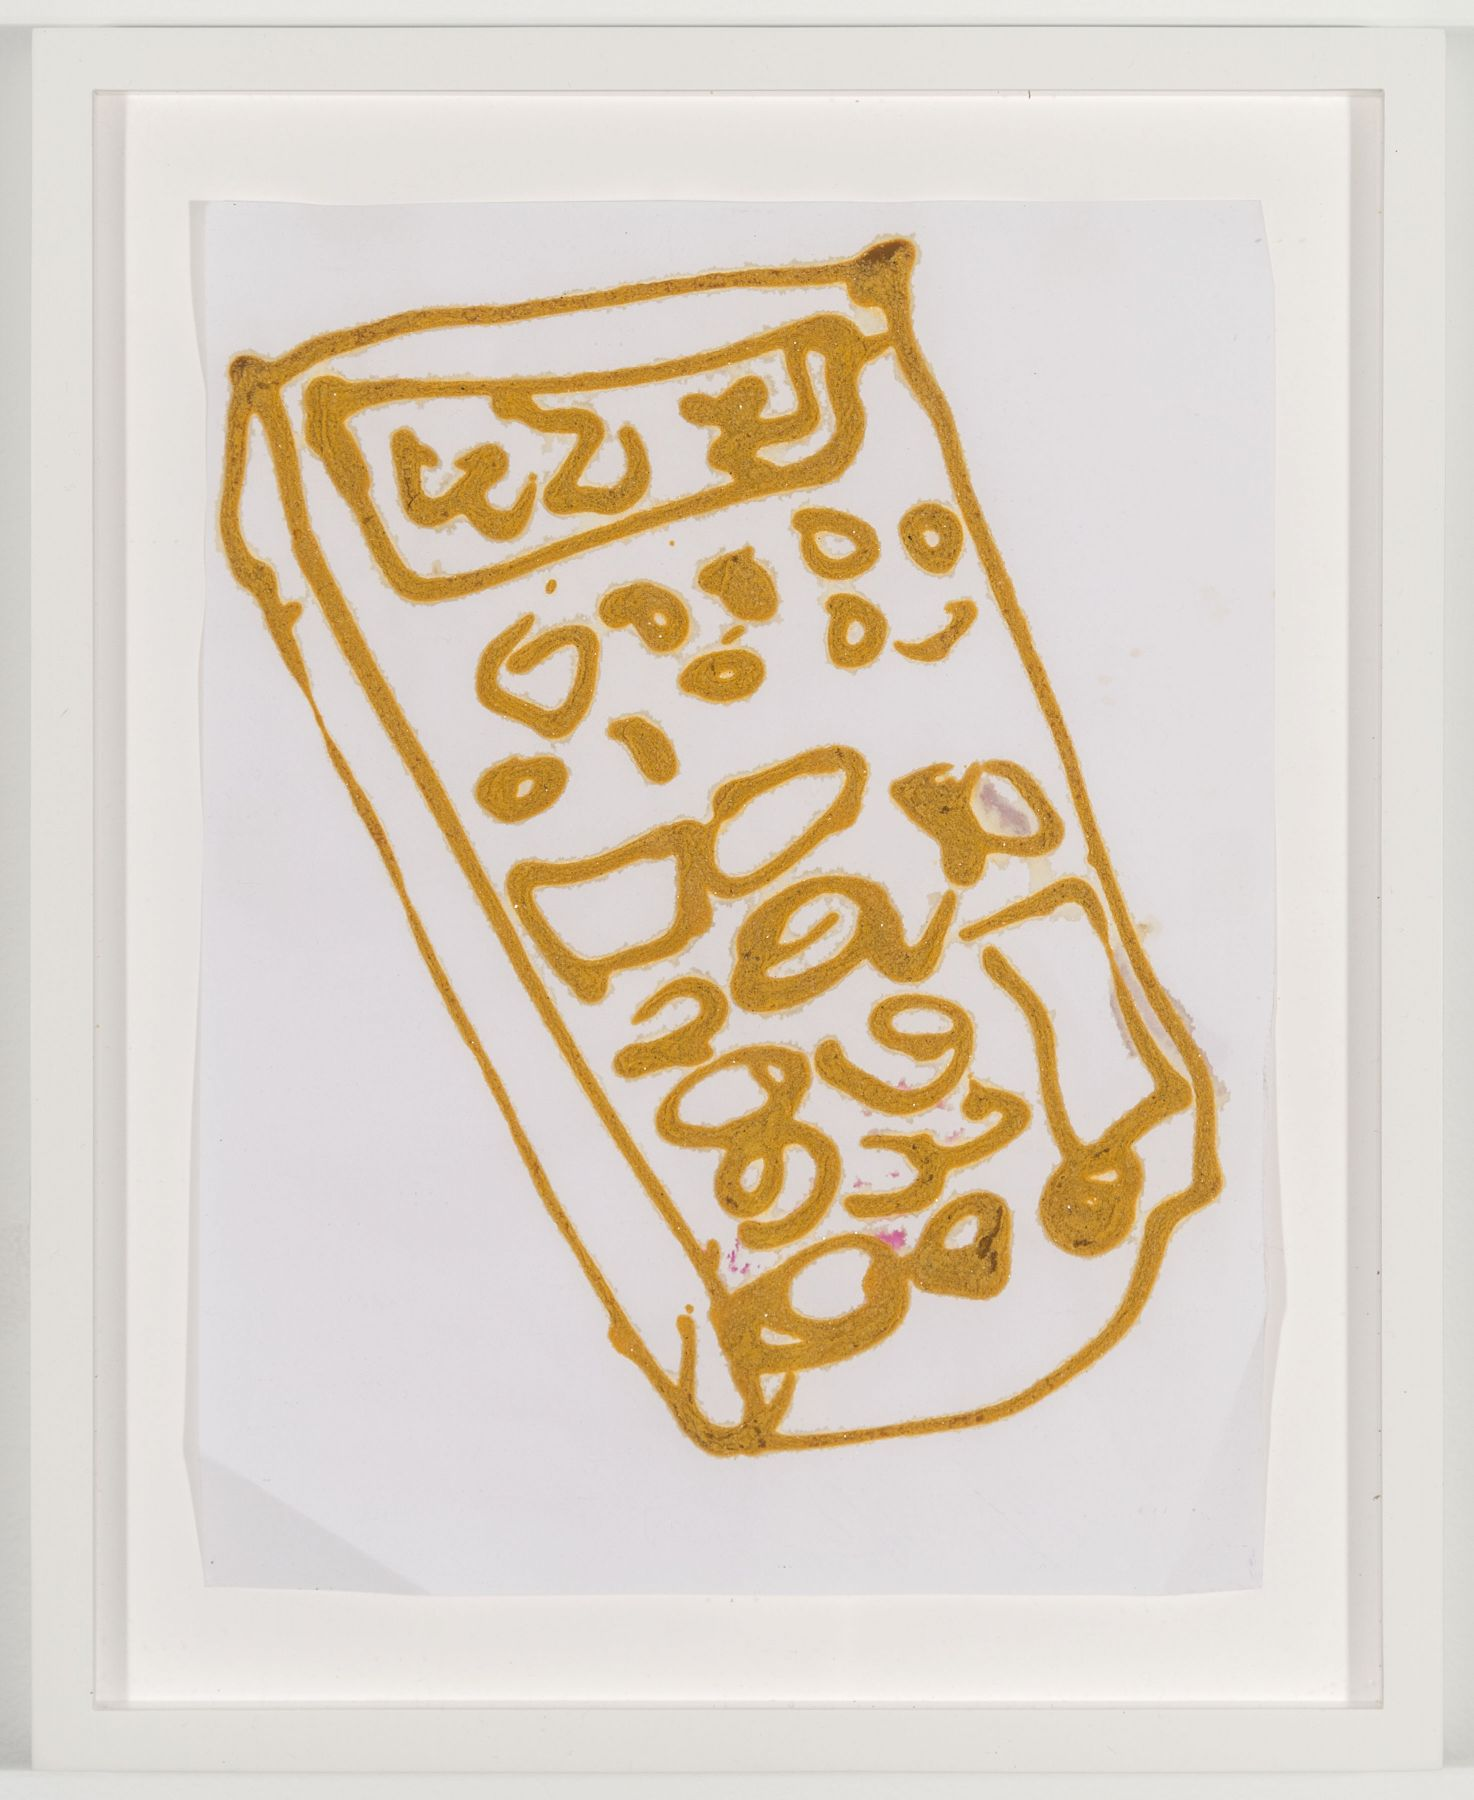 BRIAN BELOTT, Mustard Drawing (Calculator No. 2),2015